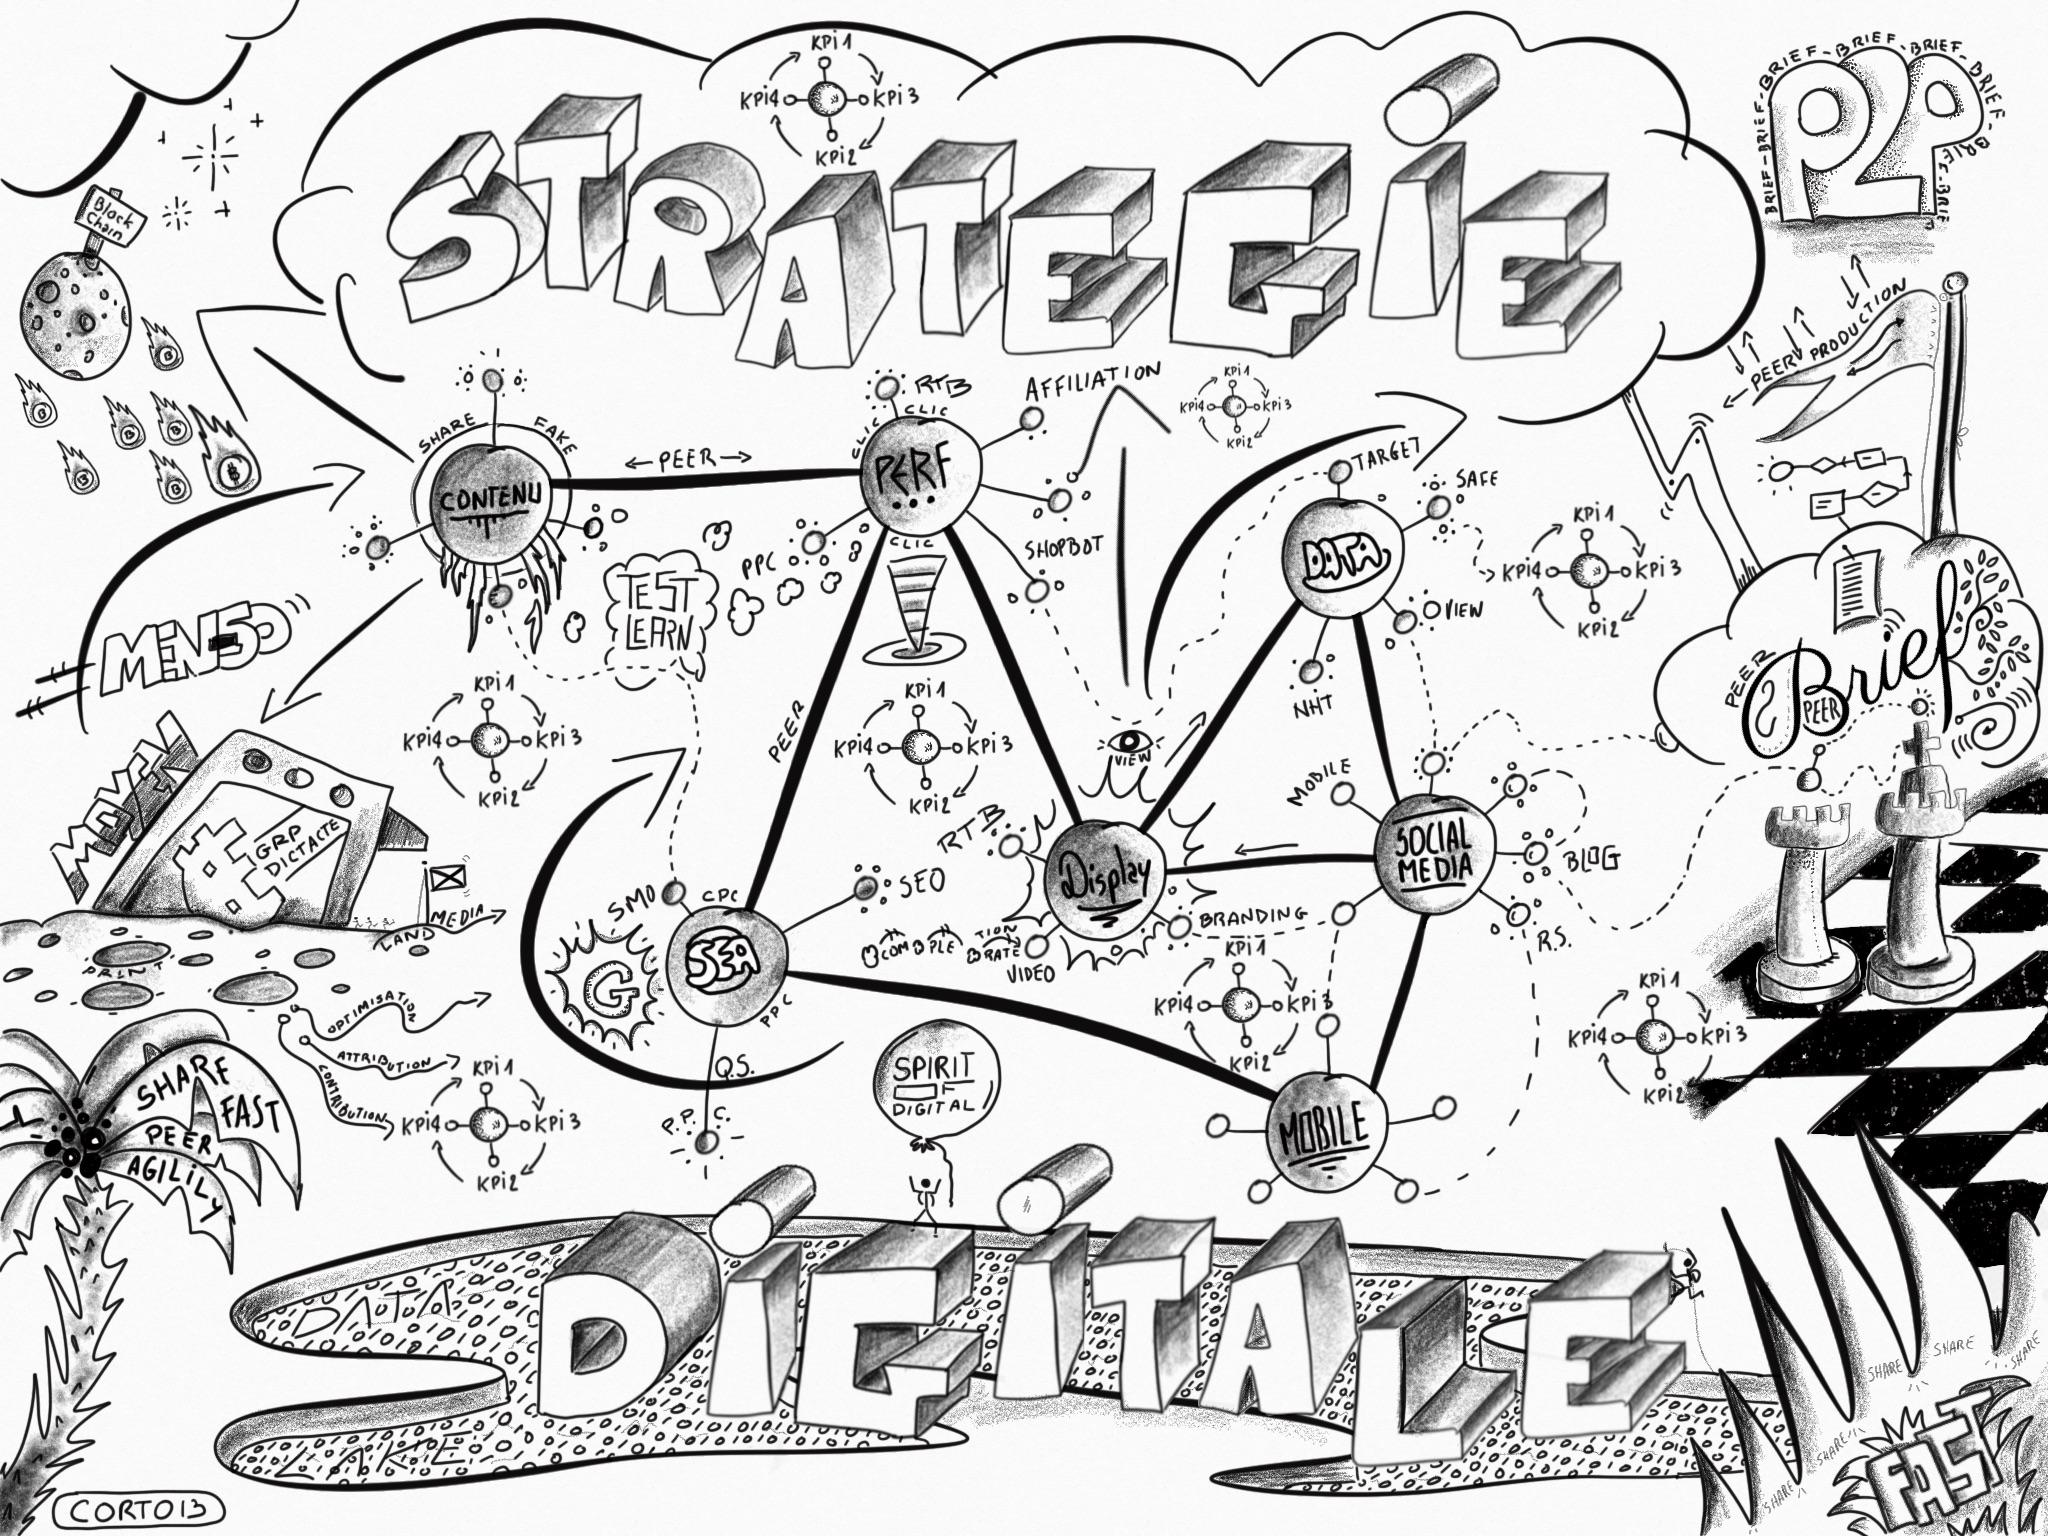 2048x1536 Digital Strategy, Ecosystem, Digital Discipline Sketch Noting